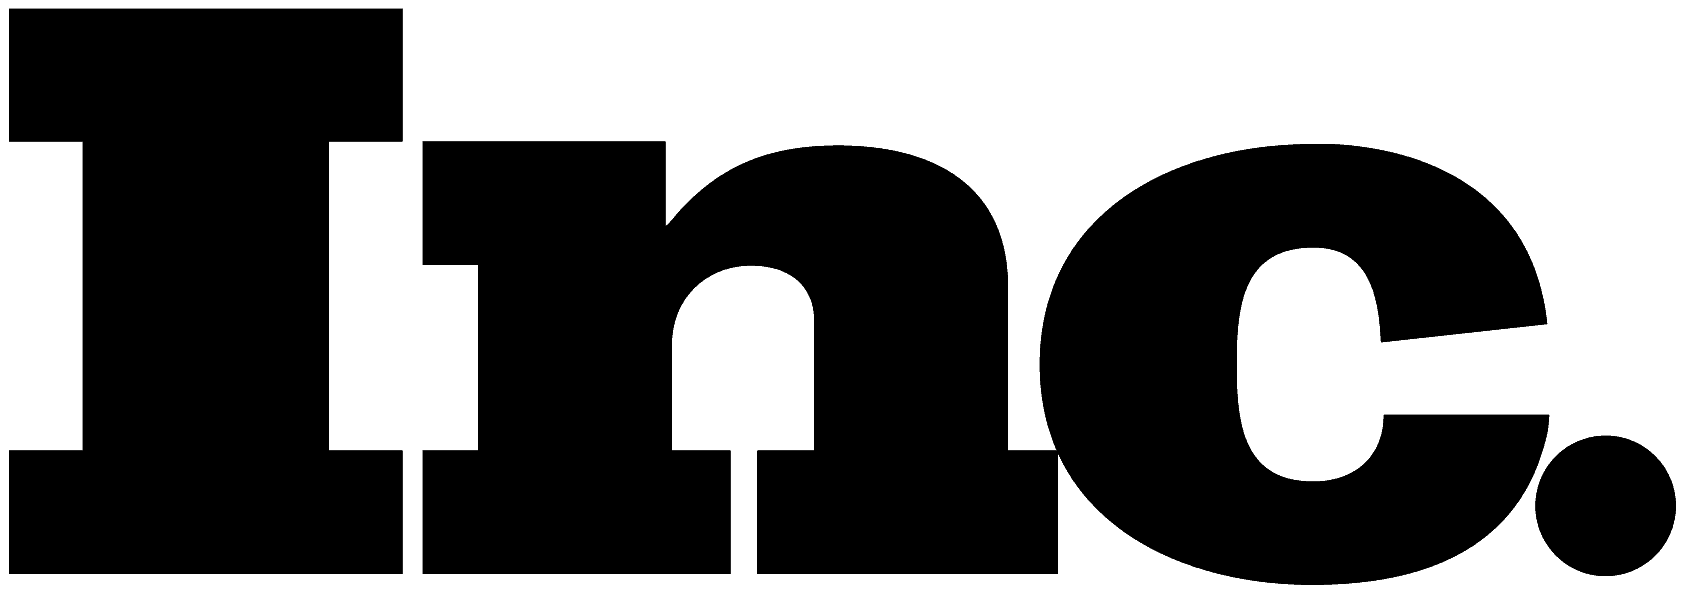 https://boss-mom.com/wp-content/uploads/2019/01/Inc-Magazine-Logo.png